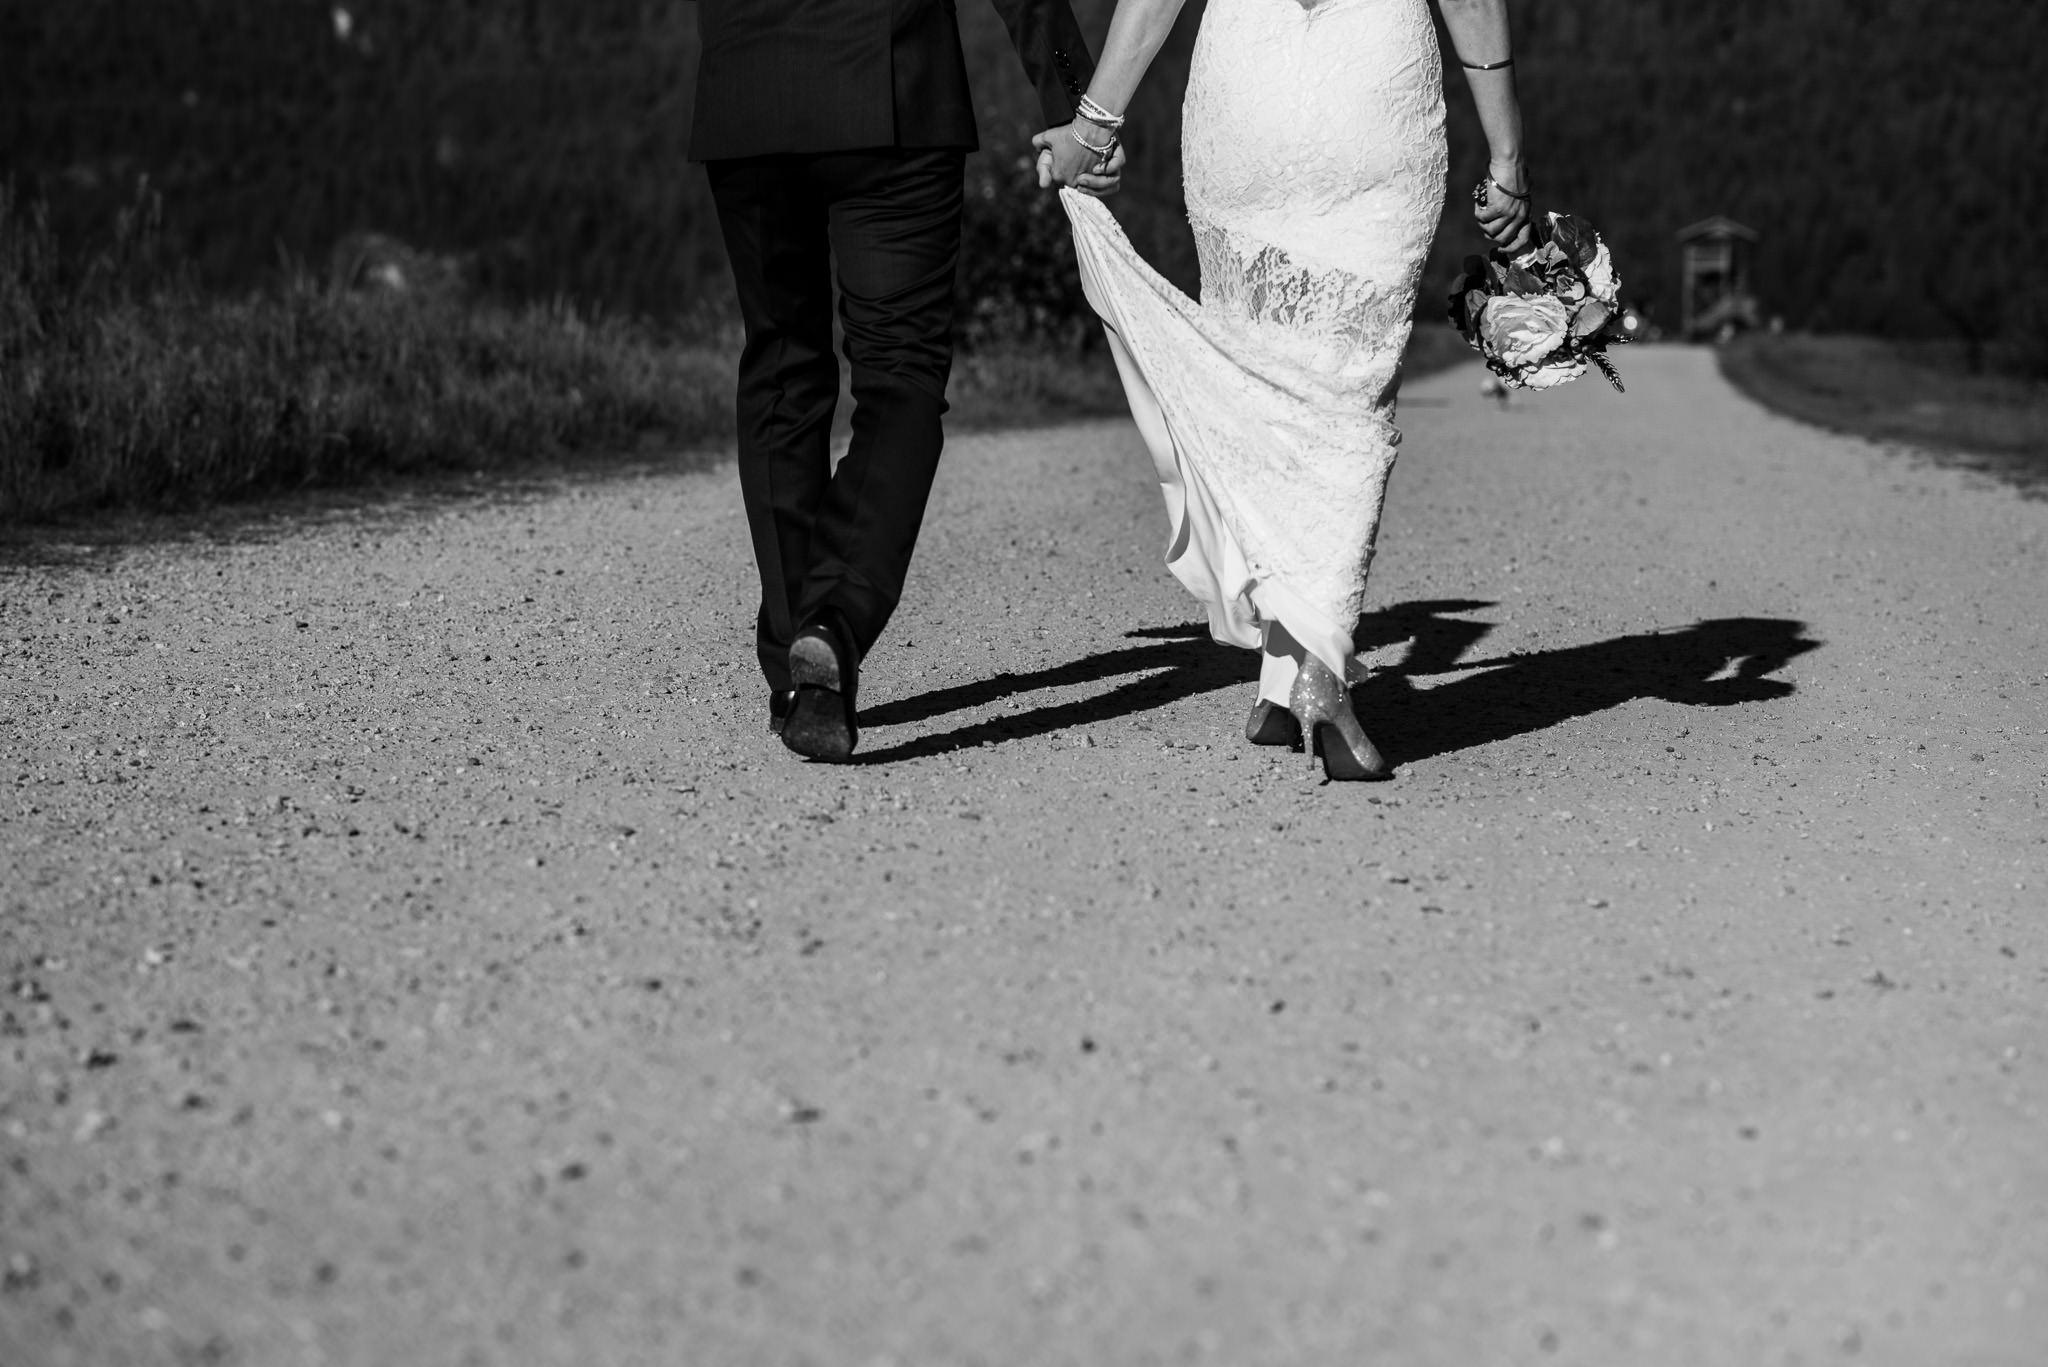 Melanie-Matt-Pitt-Lake-Post-Wedding-Shoot-Victoria-Wedding-Photographers-8.jpg